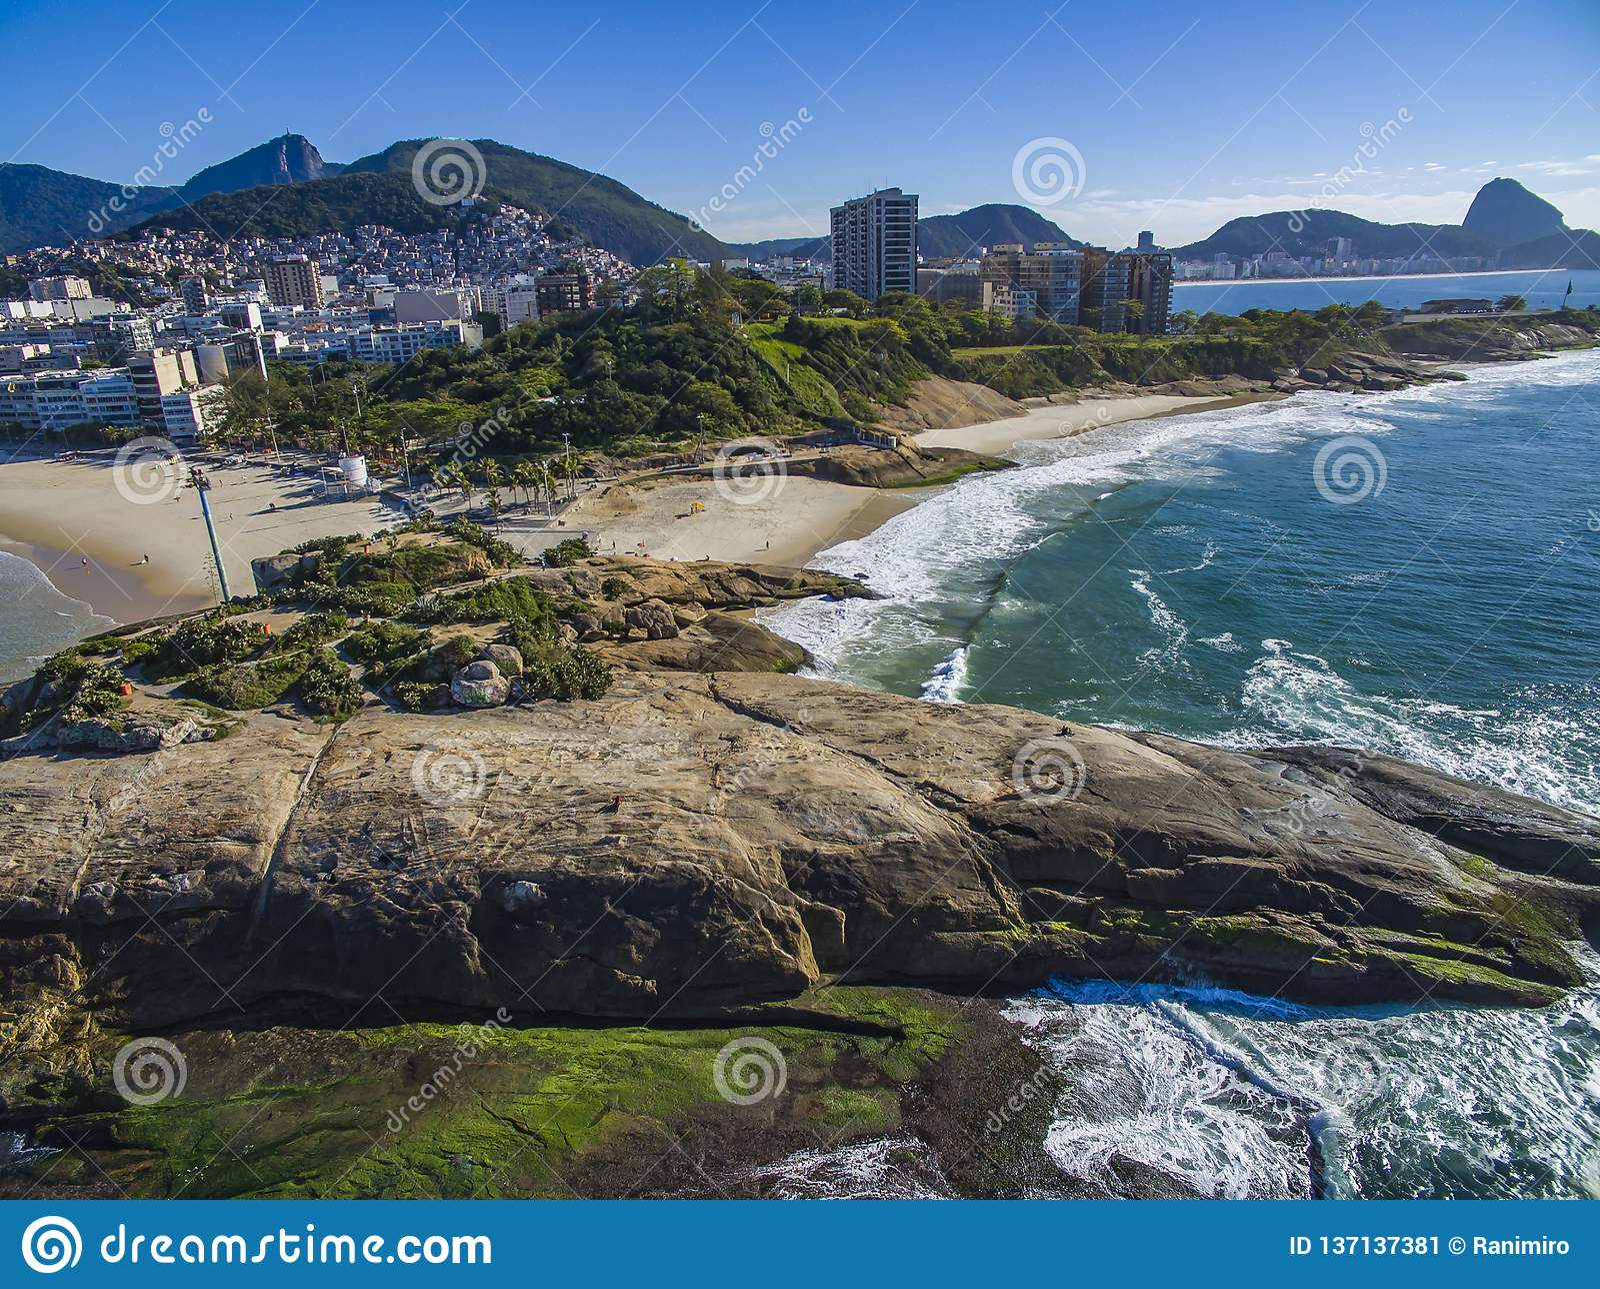 De mening tussen twee mooie stranden Arpoadorstrand, Duivels` s Strand, Ipanema-district van Rio de Janeiro Brazil